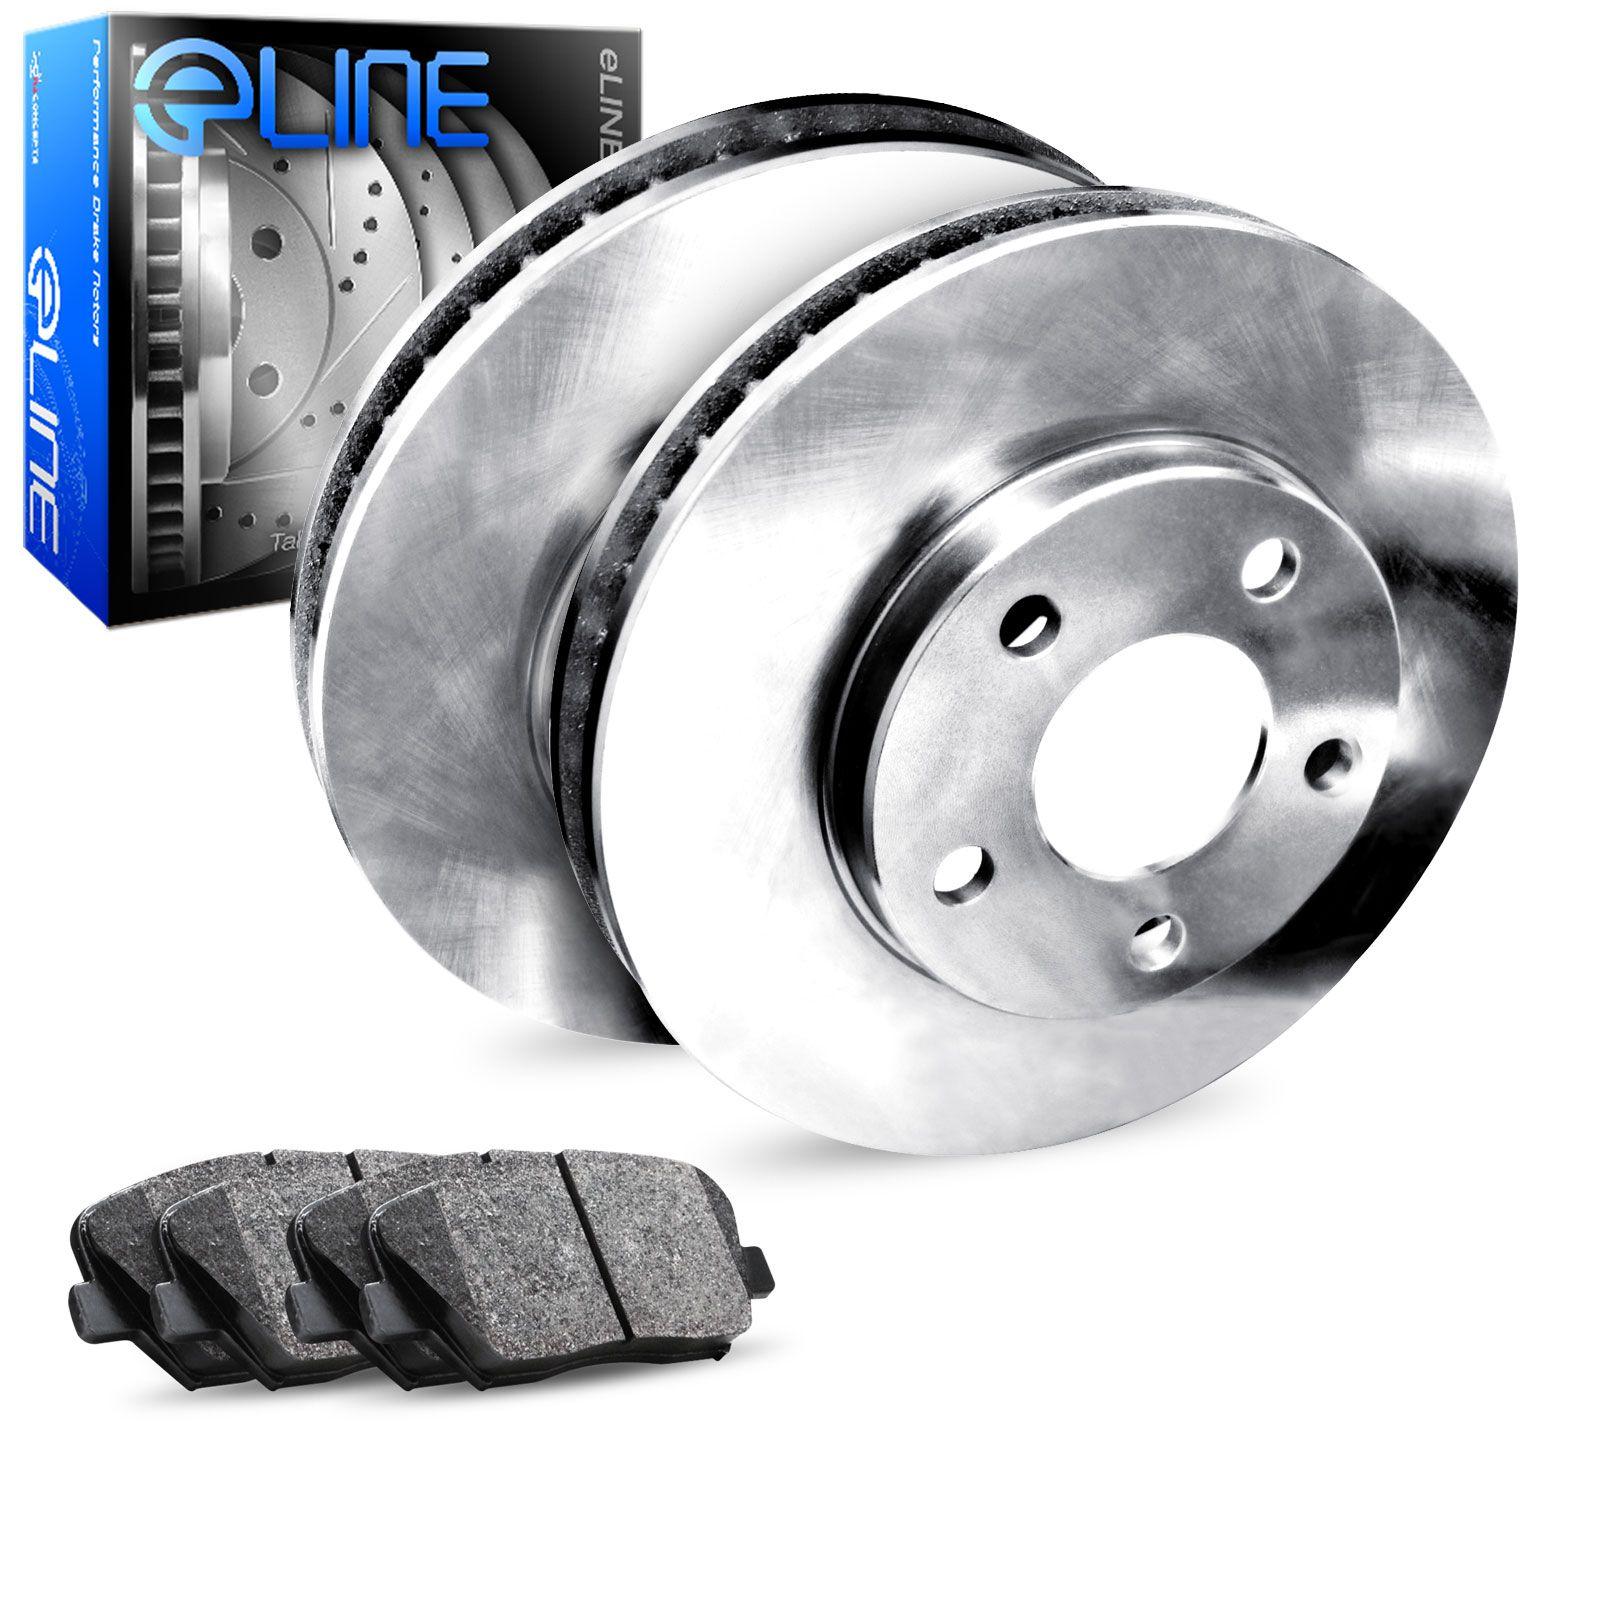 Fits 2012 2013 2014 2015 Honda CR-V Rear eLine Plain Brake Disc Rotors & Ceramic Brake Pads